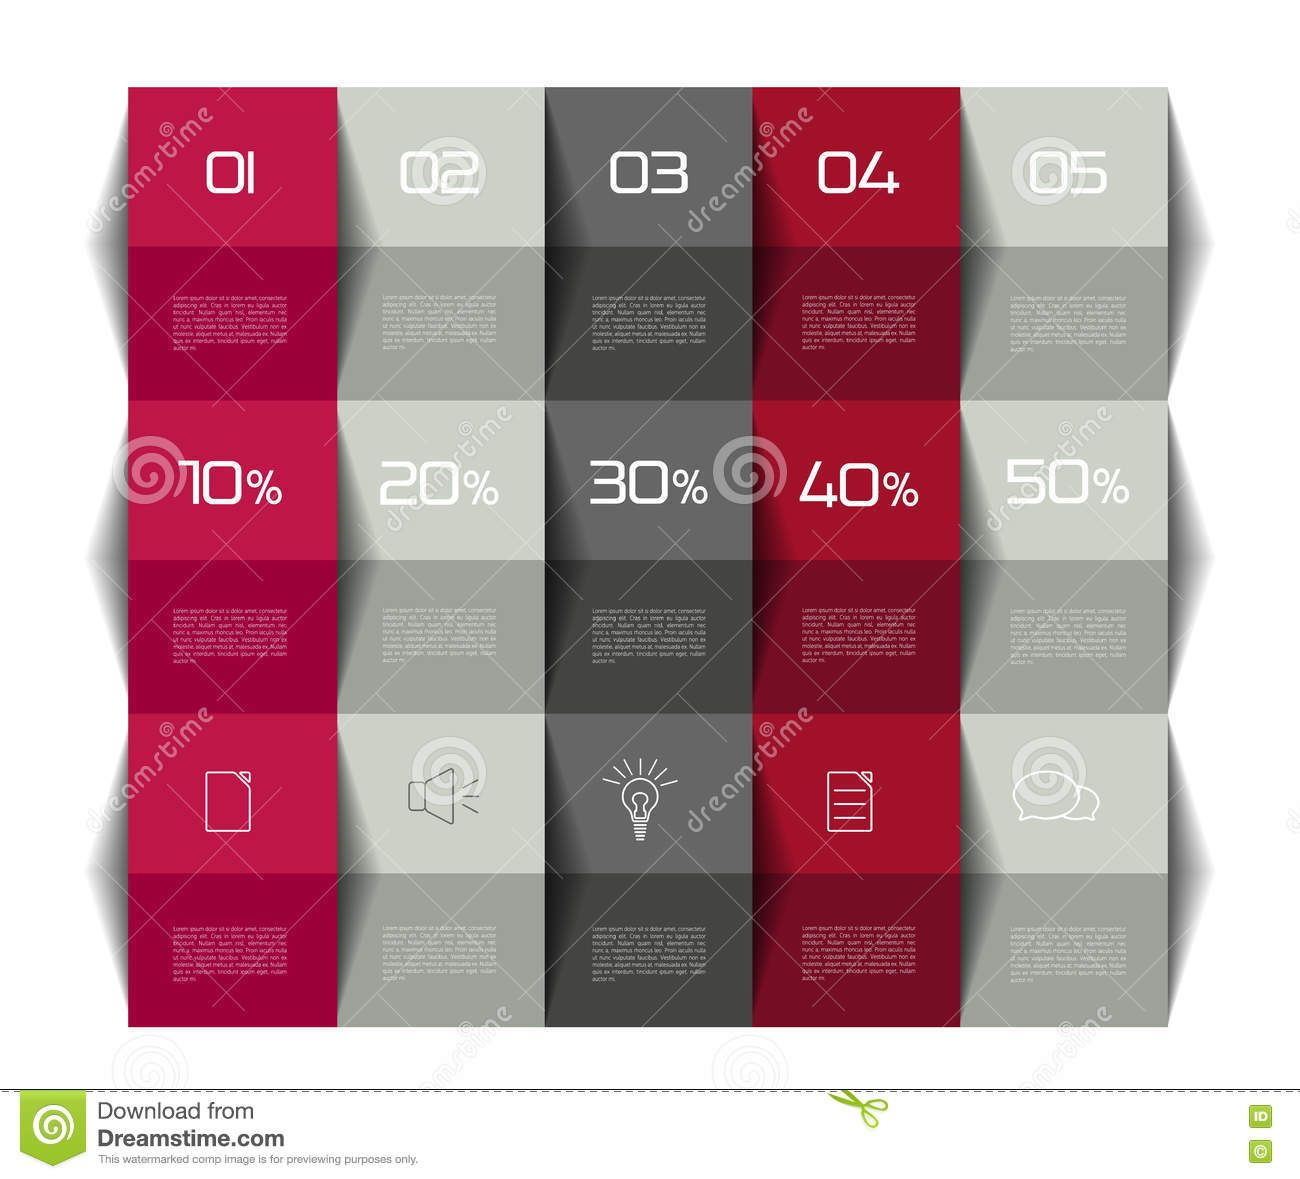 design schedule おしゃれまとめの人気アイデア pinterest sofiduo